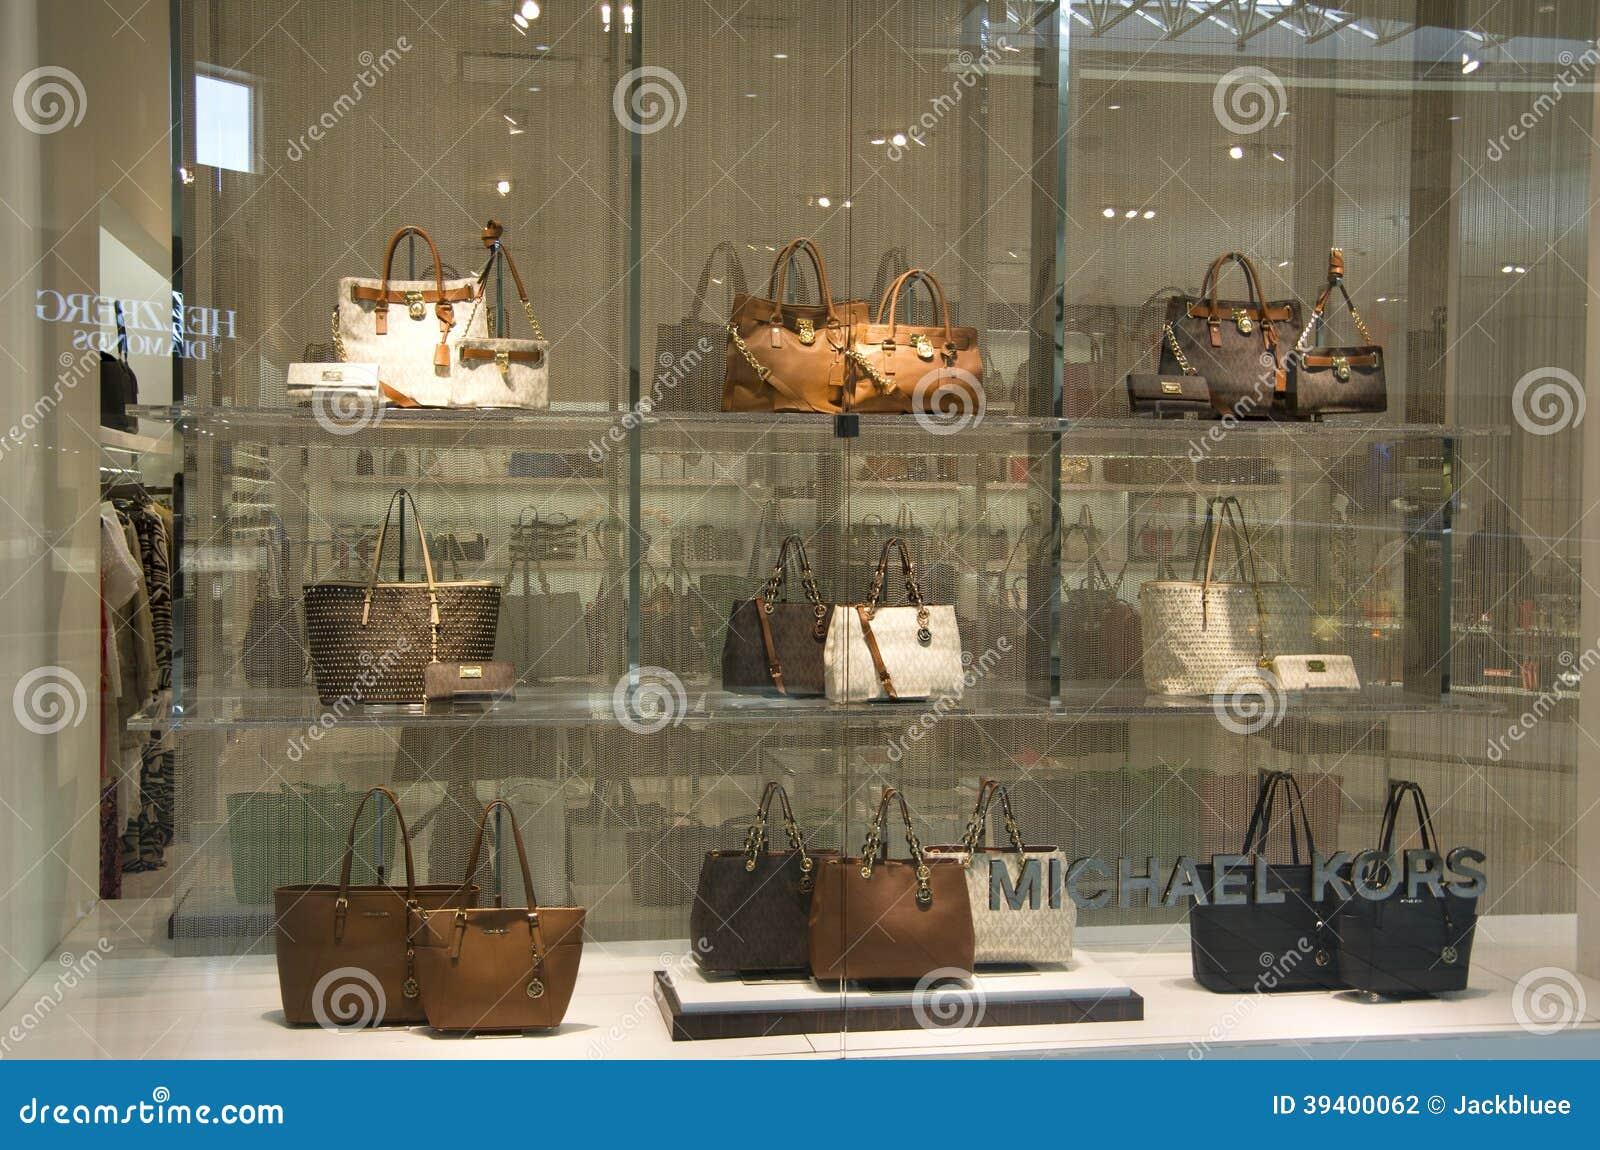 b7908c237b9 Michael Kors Cabazon Outlet Store Cheap Michael Kors Crossbody ...